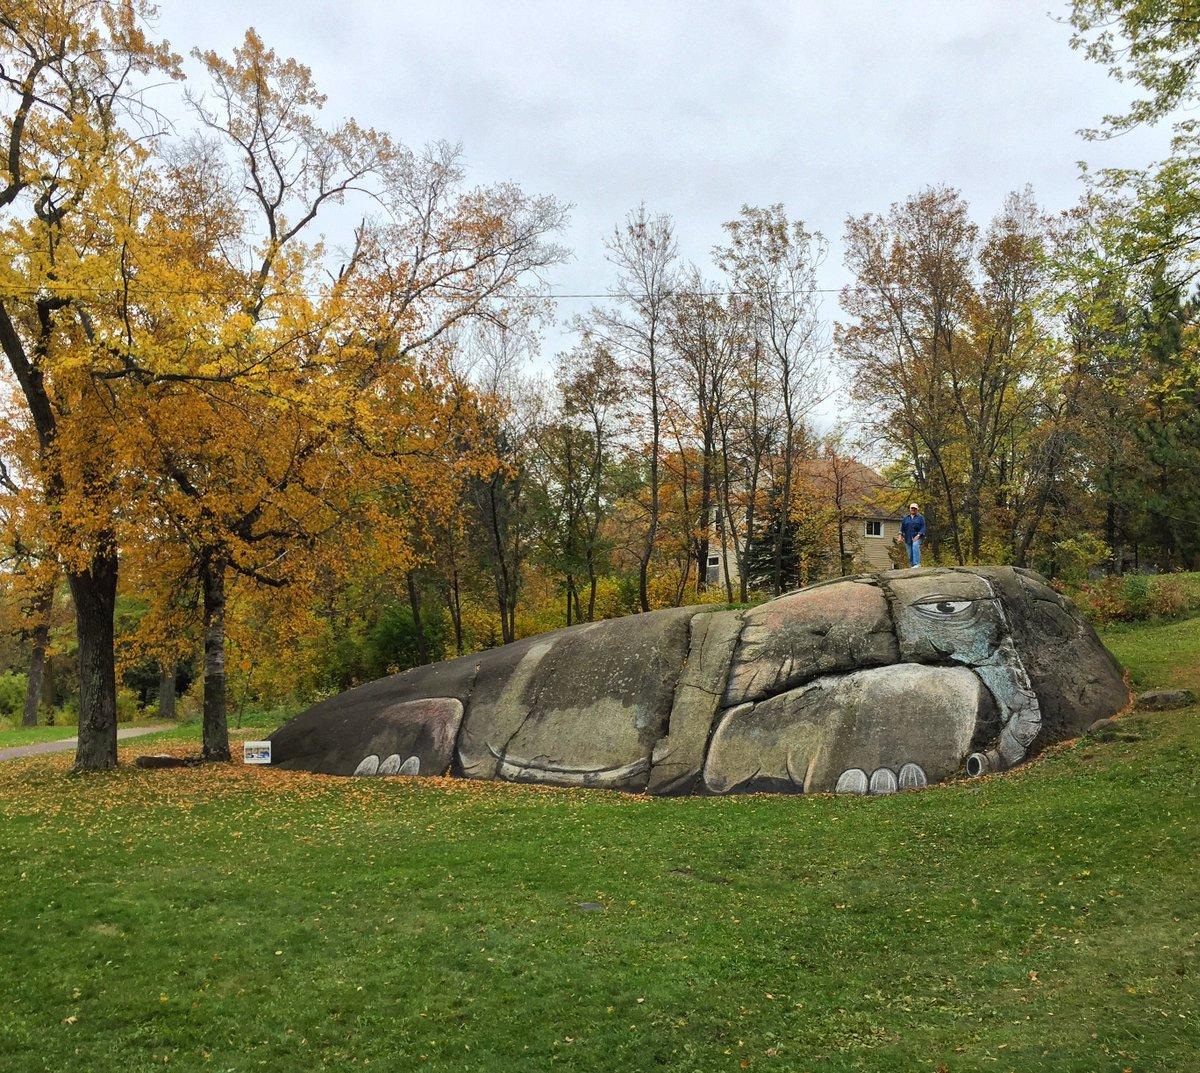 andrew krueger on twitter elephant rock in lincoln park in duluth